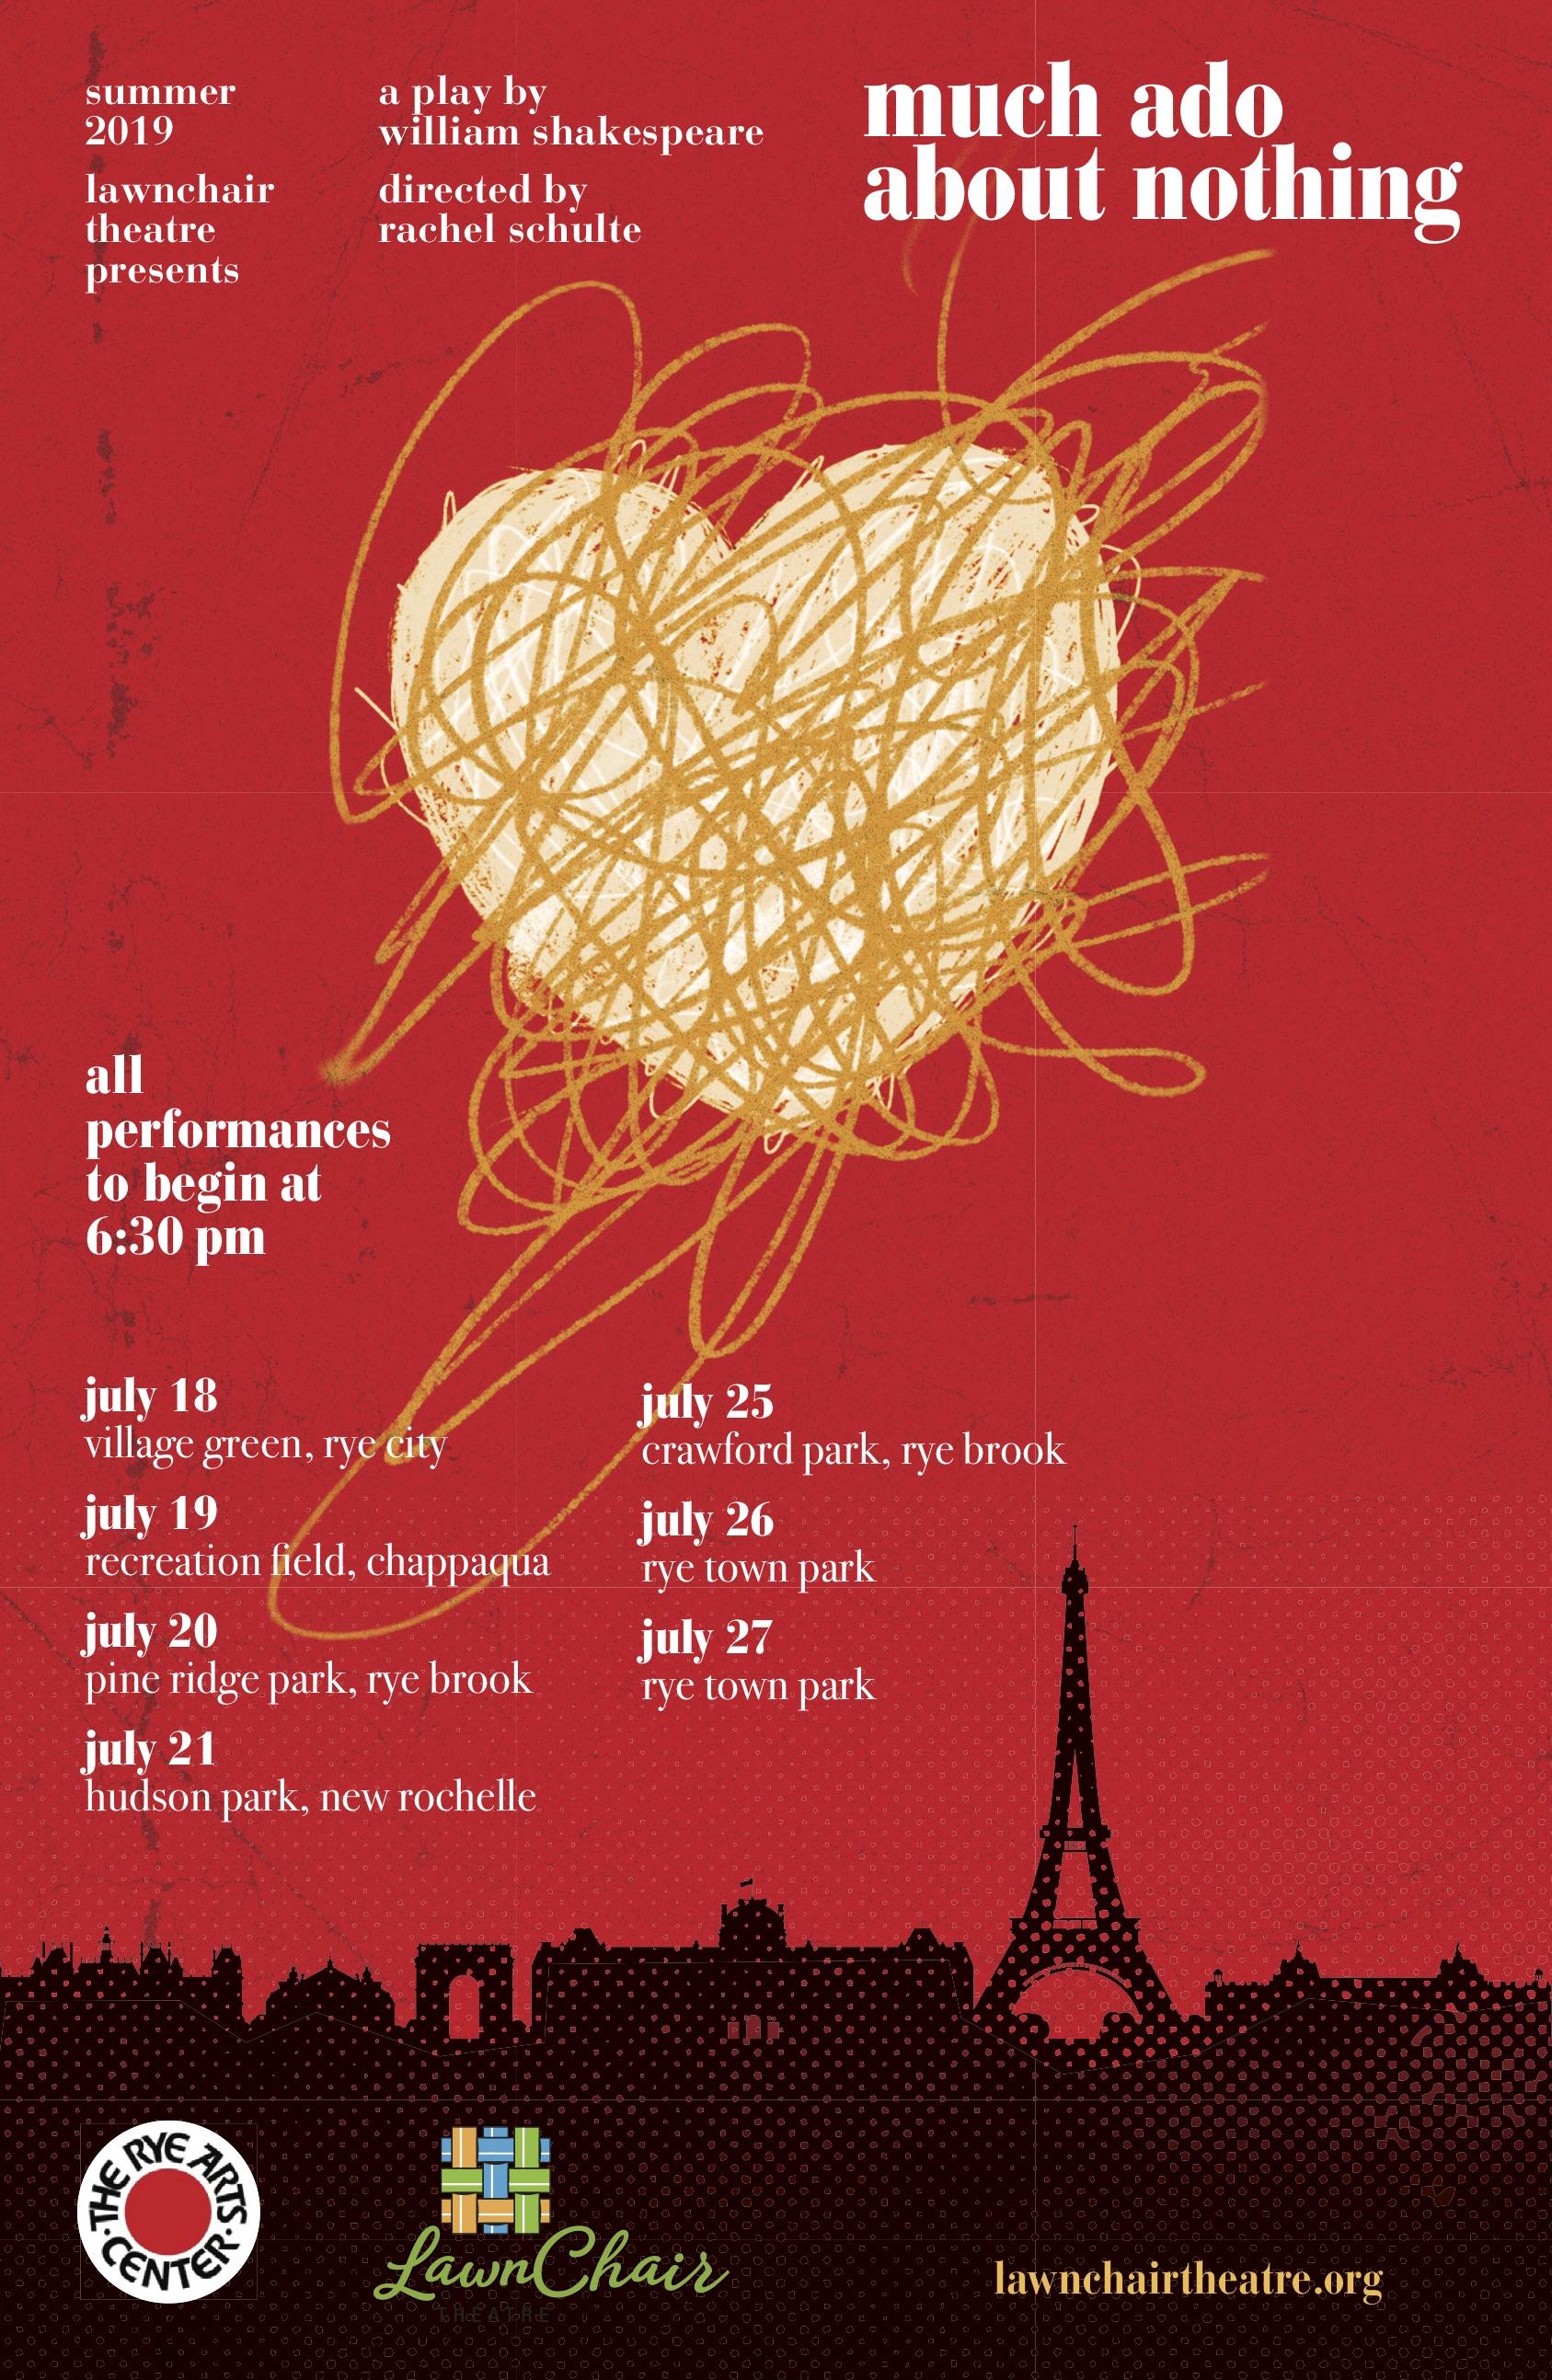 LCT_MuchAdo_Poster.jpg